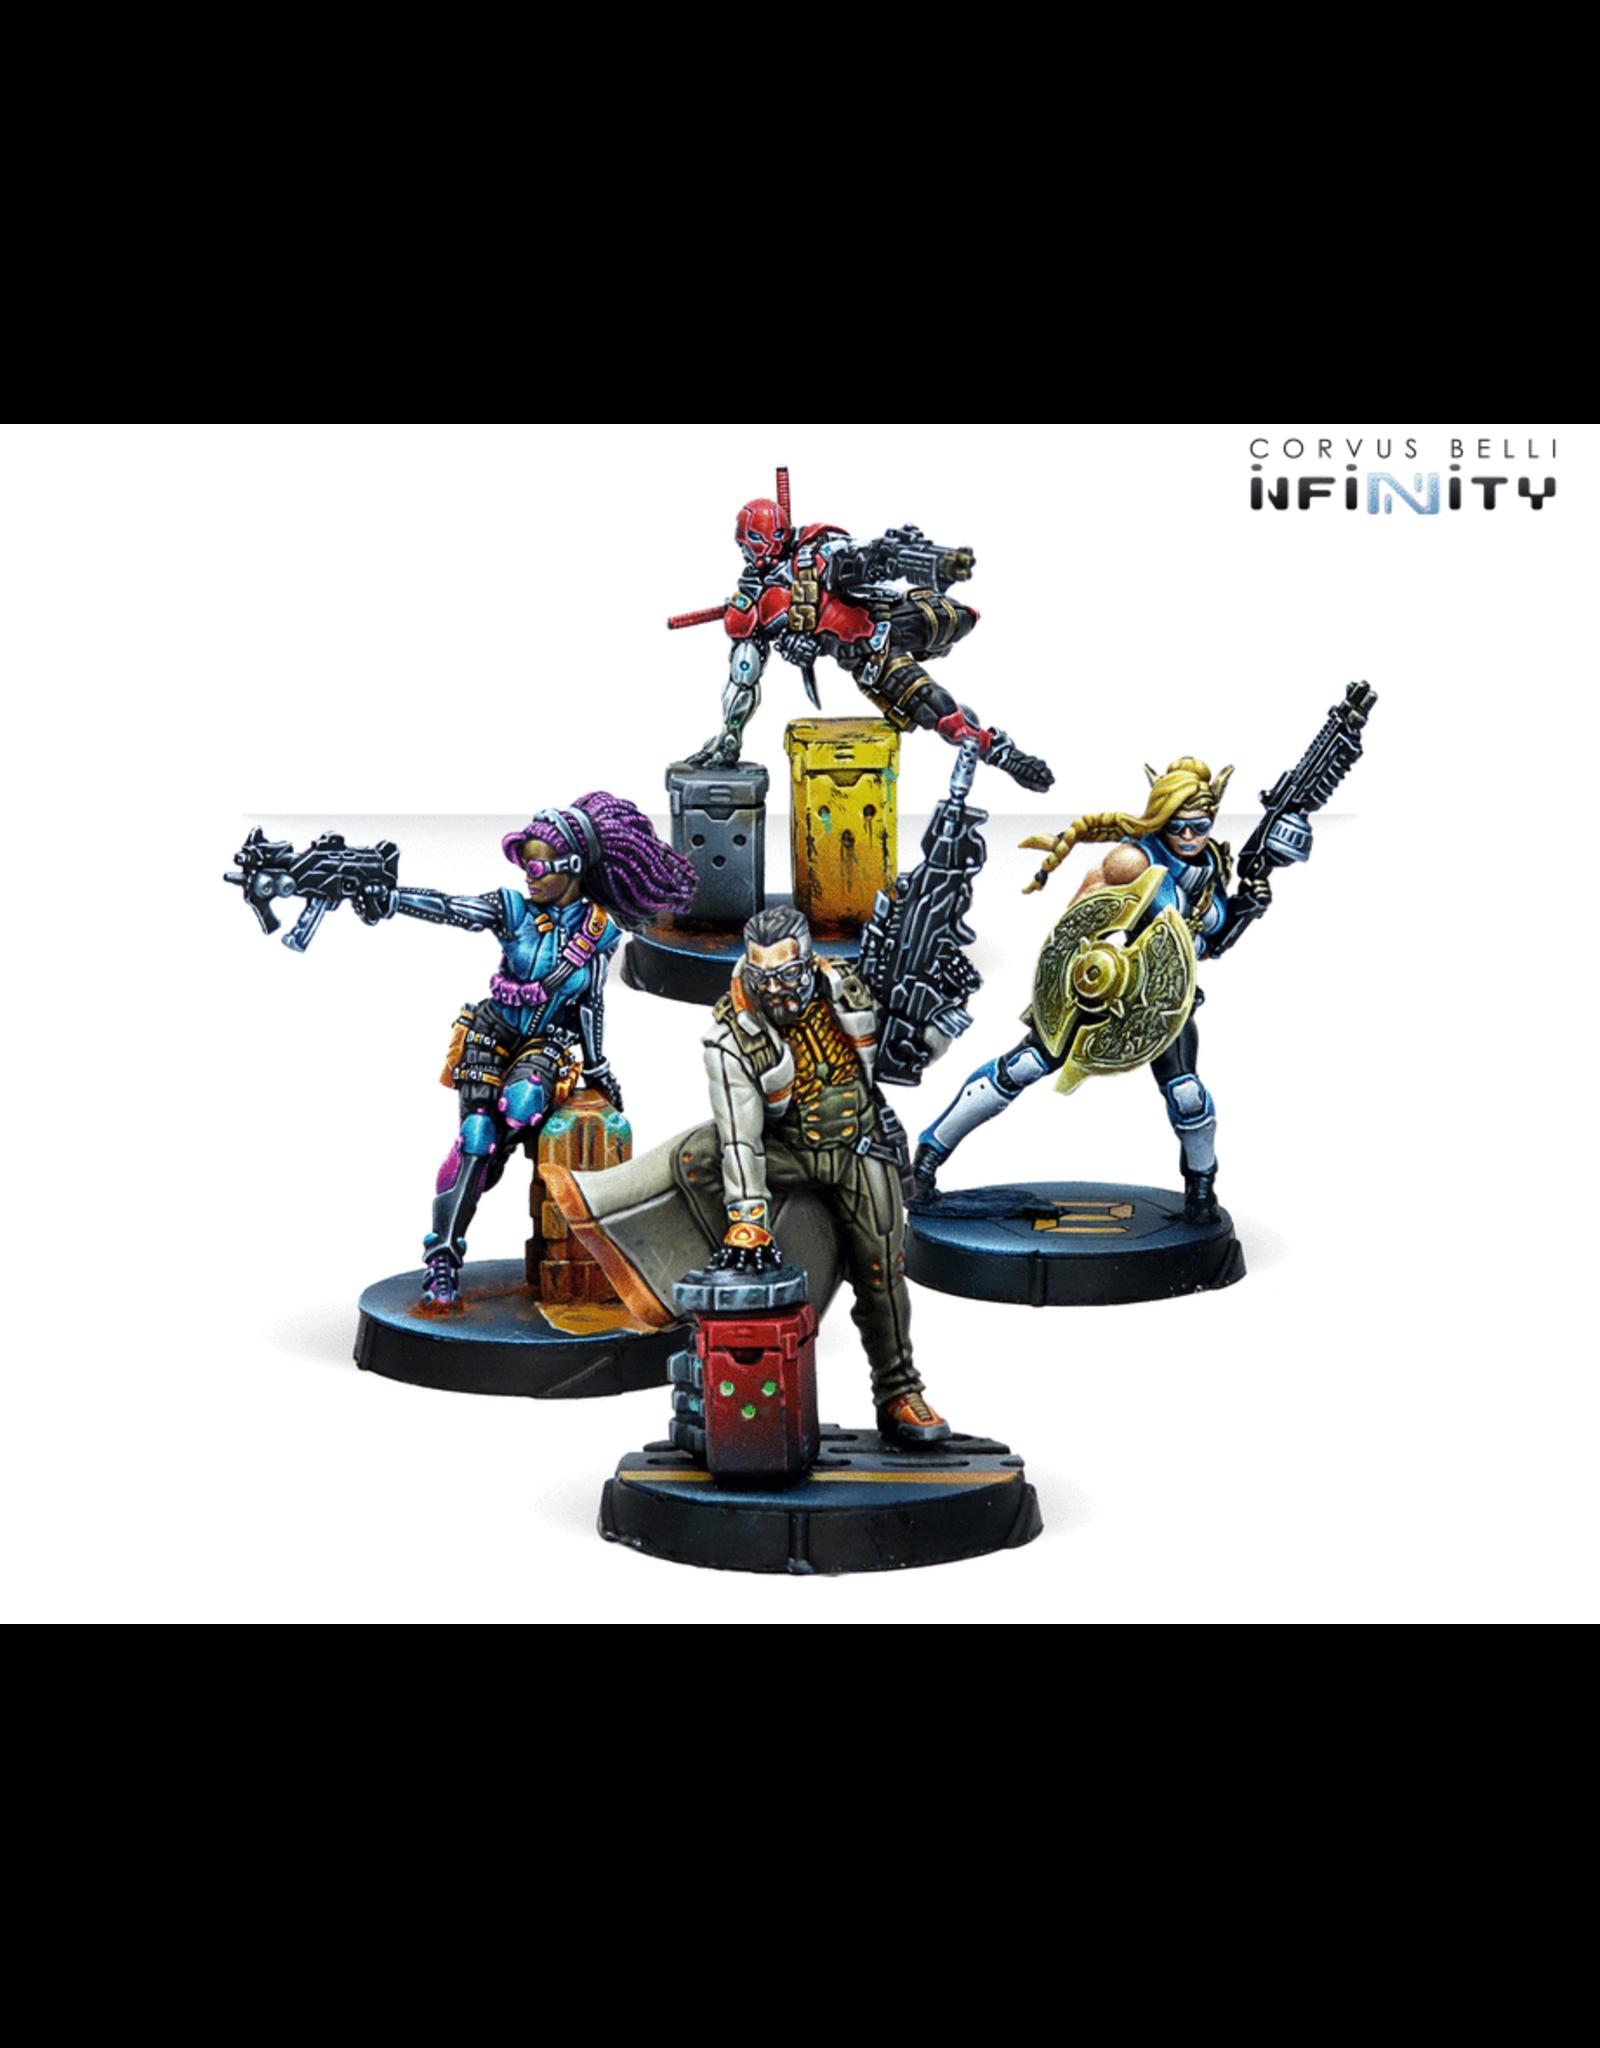 Corvus Belli Infinity: Soldiers of Fortune